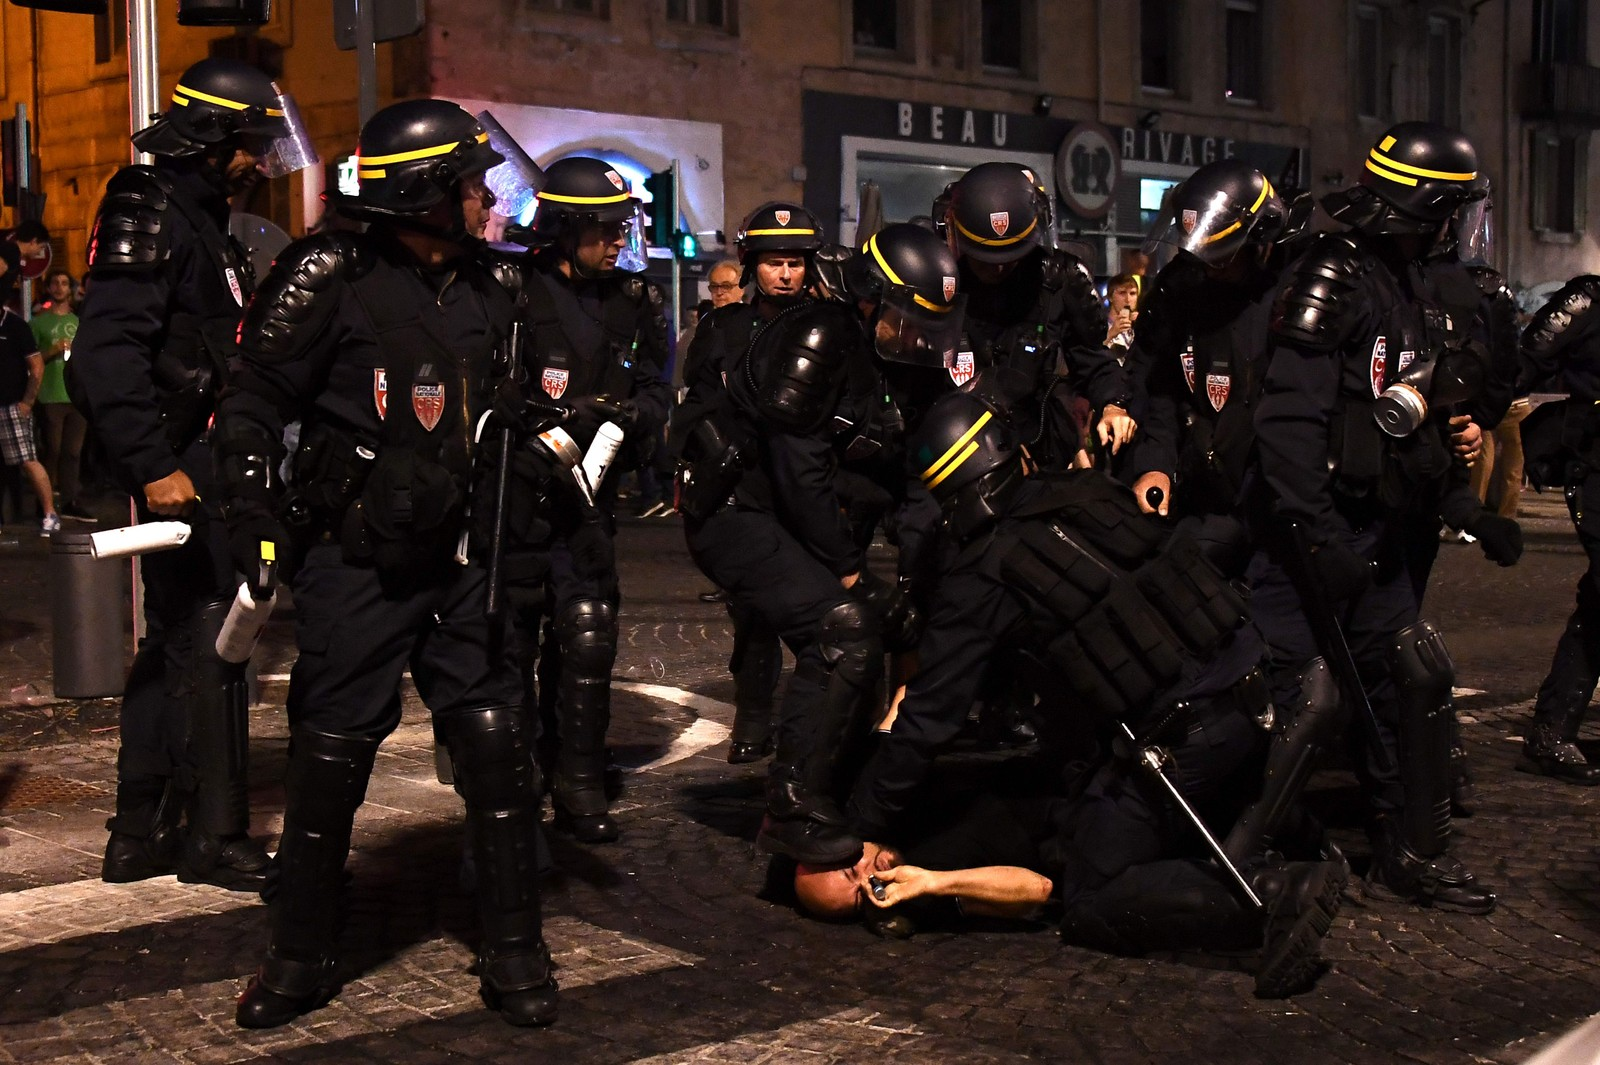 Fotballsuppoertere og politi i sammenstøt i Marseille